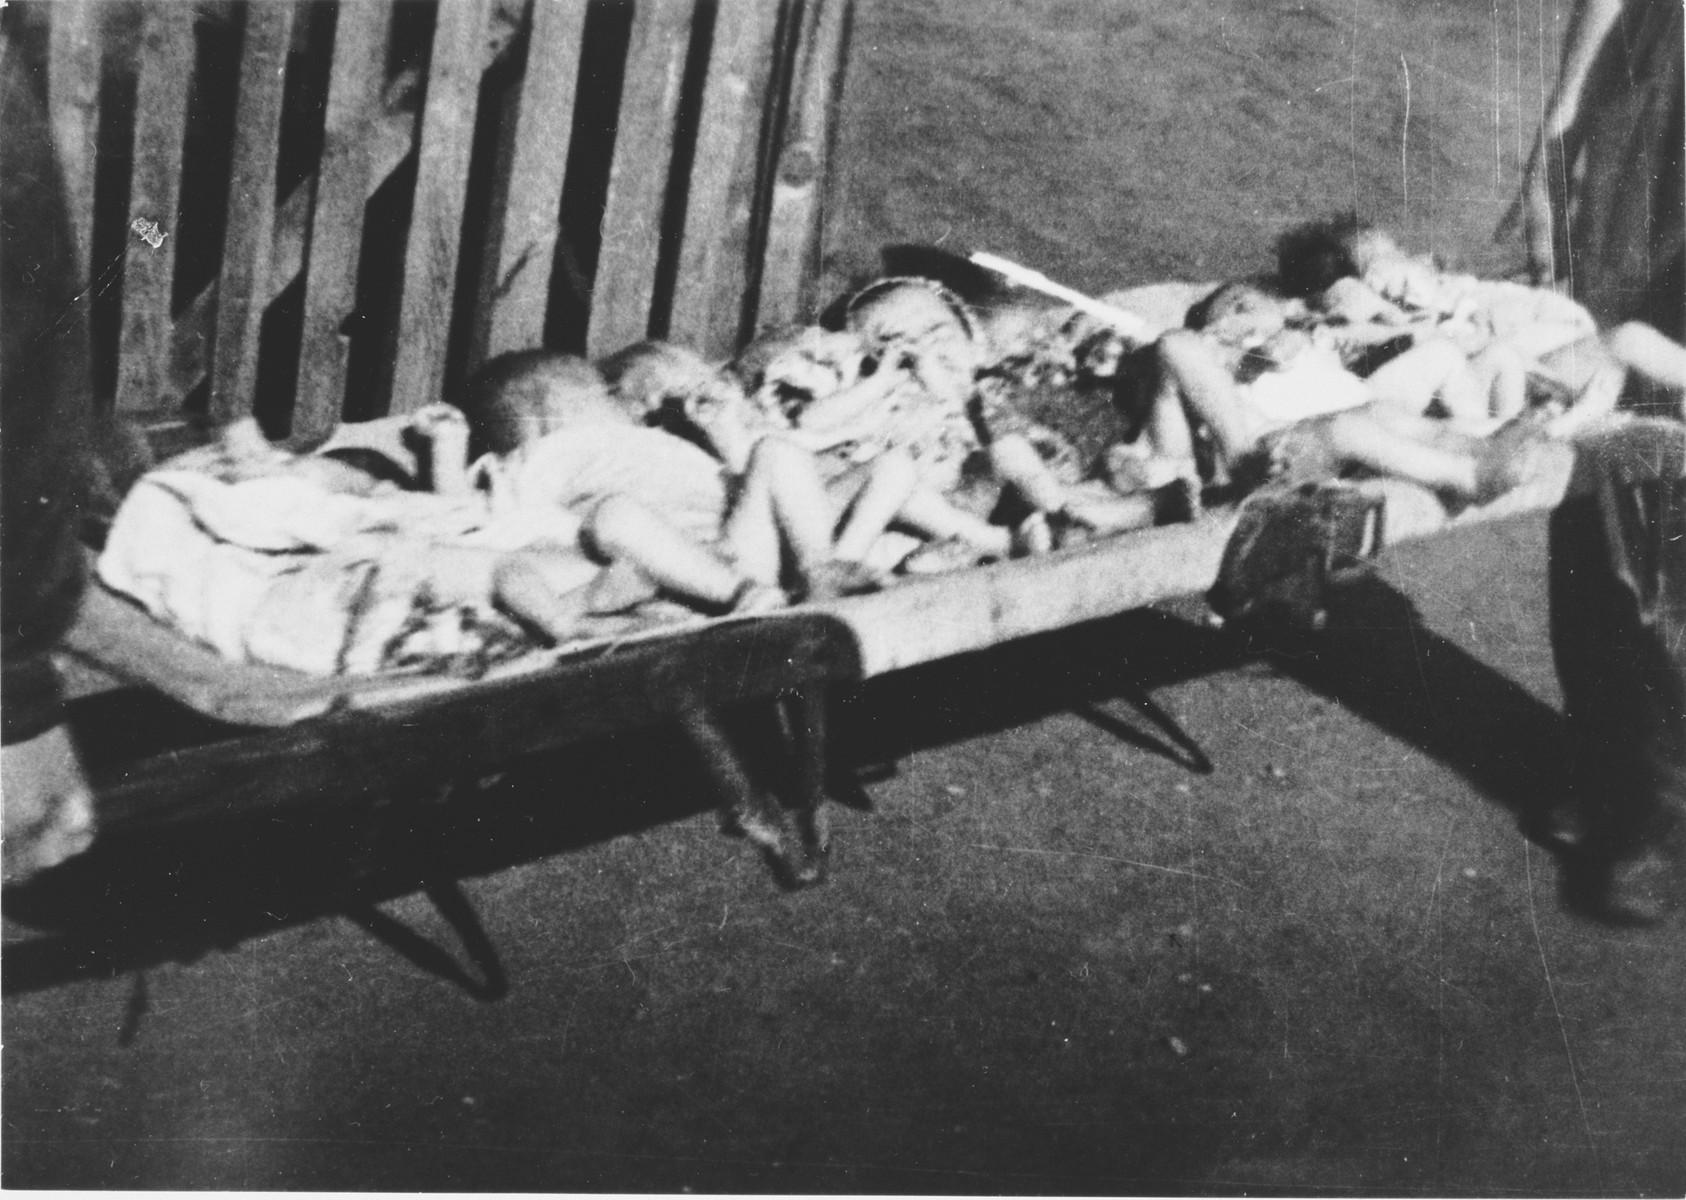 Yugoslav infants lie in a row on a stretcher in the Jastrebarsko concentration camp.